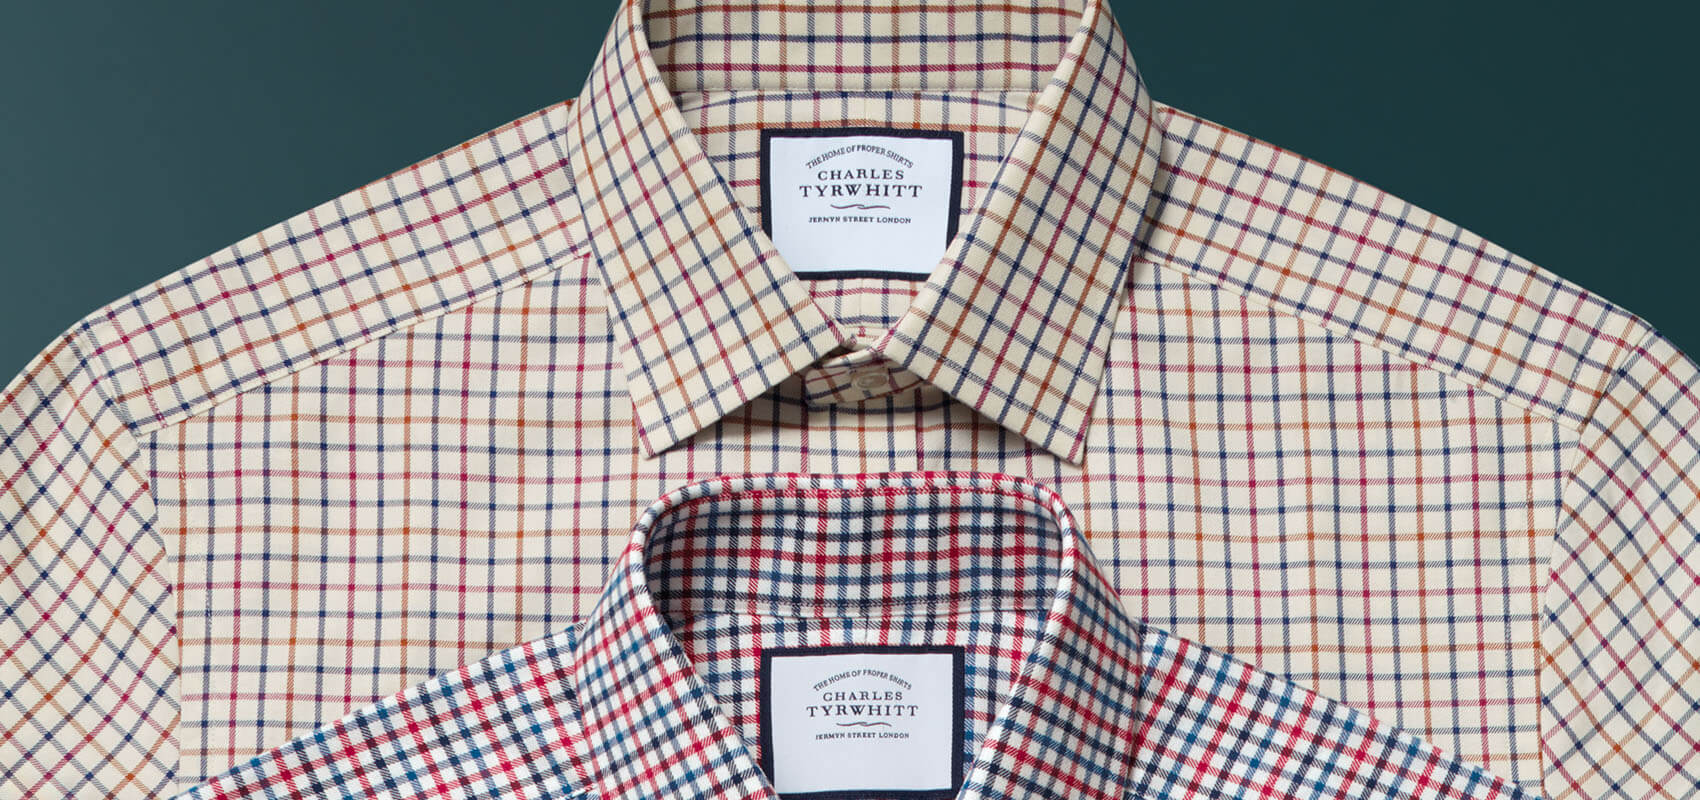 Charles Tyrwhitt Brushed Cotton Shirts